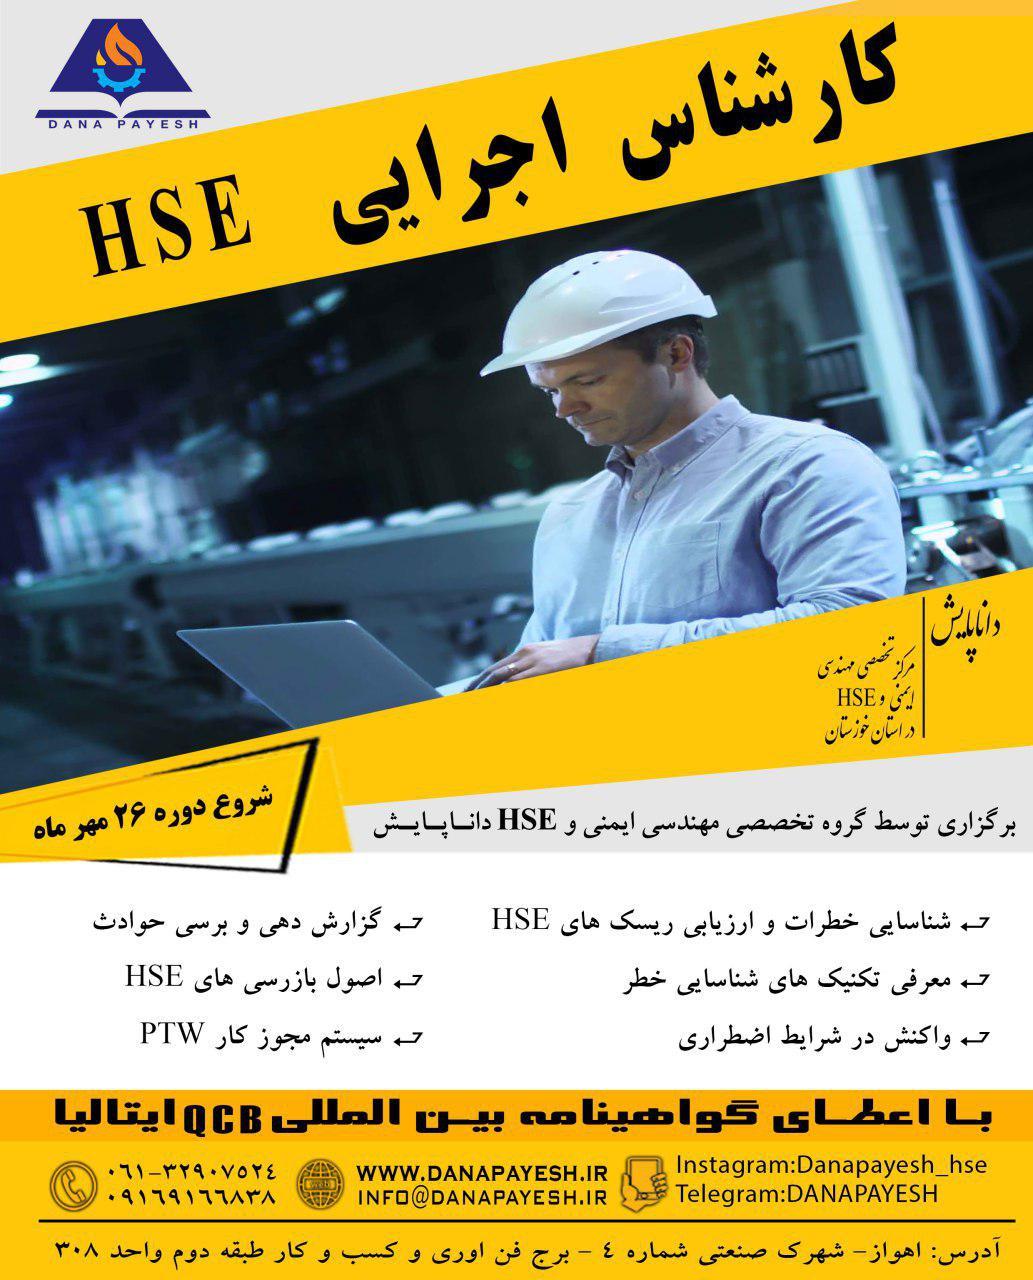 کارشناس اجرایی HSE